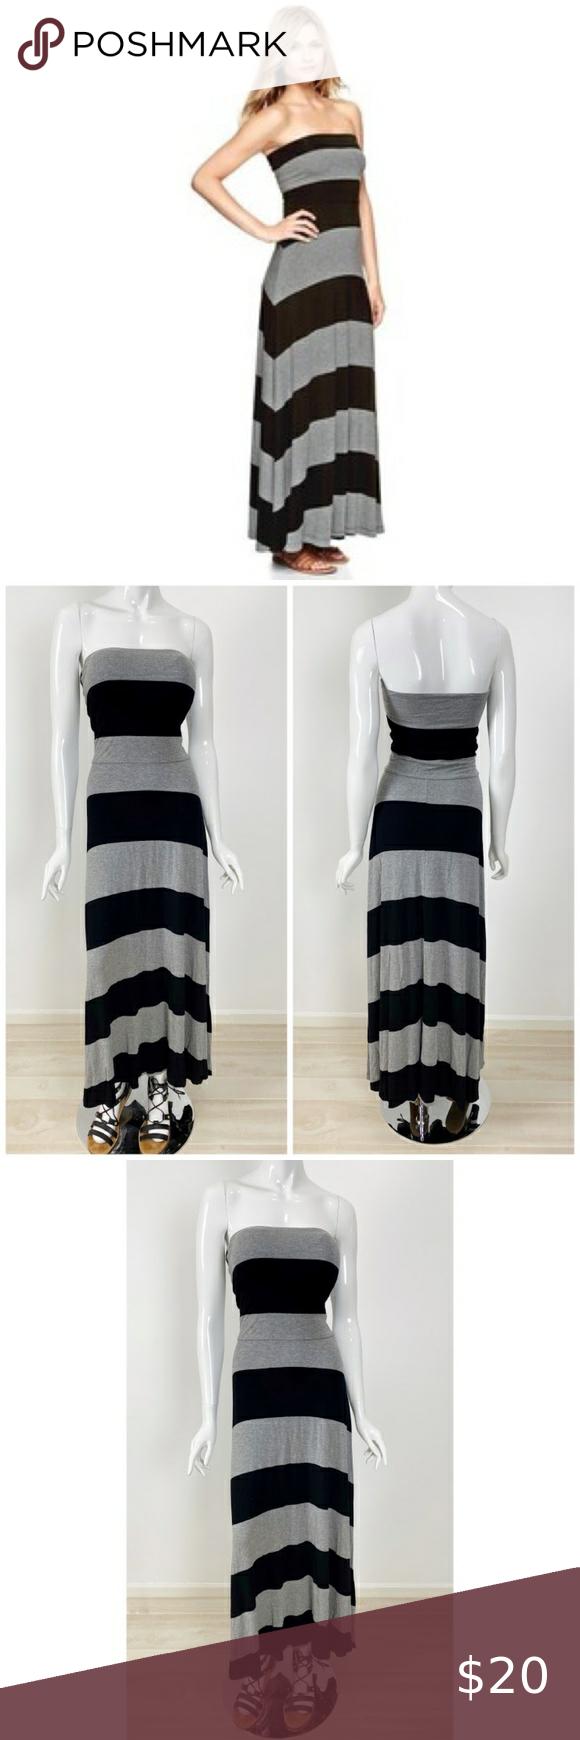 Gap Gray Black Convert 4 In 1 Maxi Dress Size S Maxi Dress Full Length Dress Striped Maxi Dresses [ 1740 x 580 Pixel ]